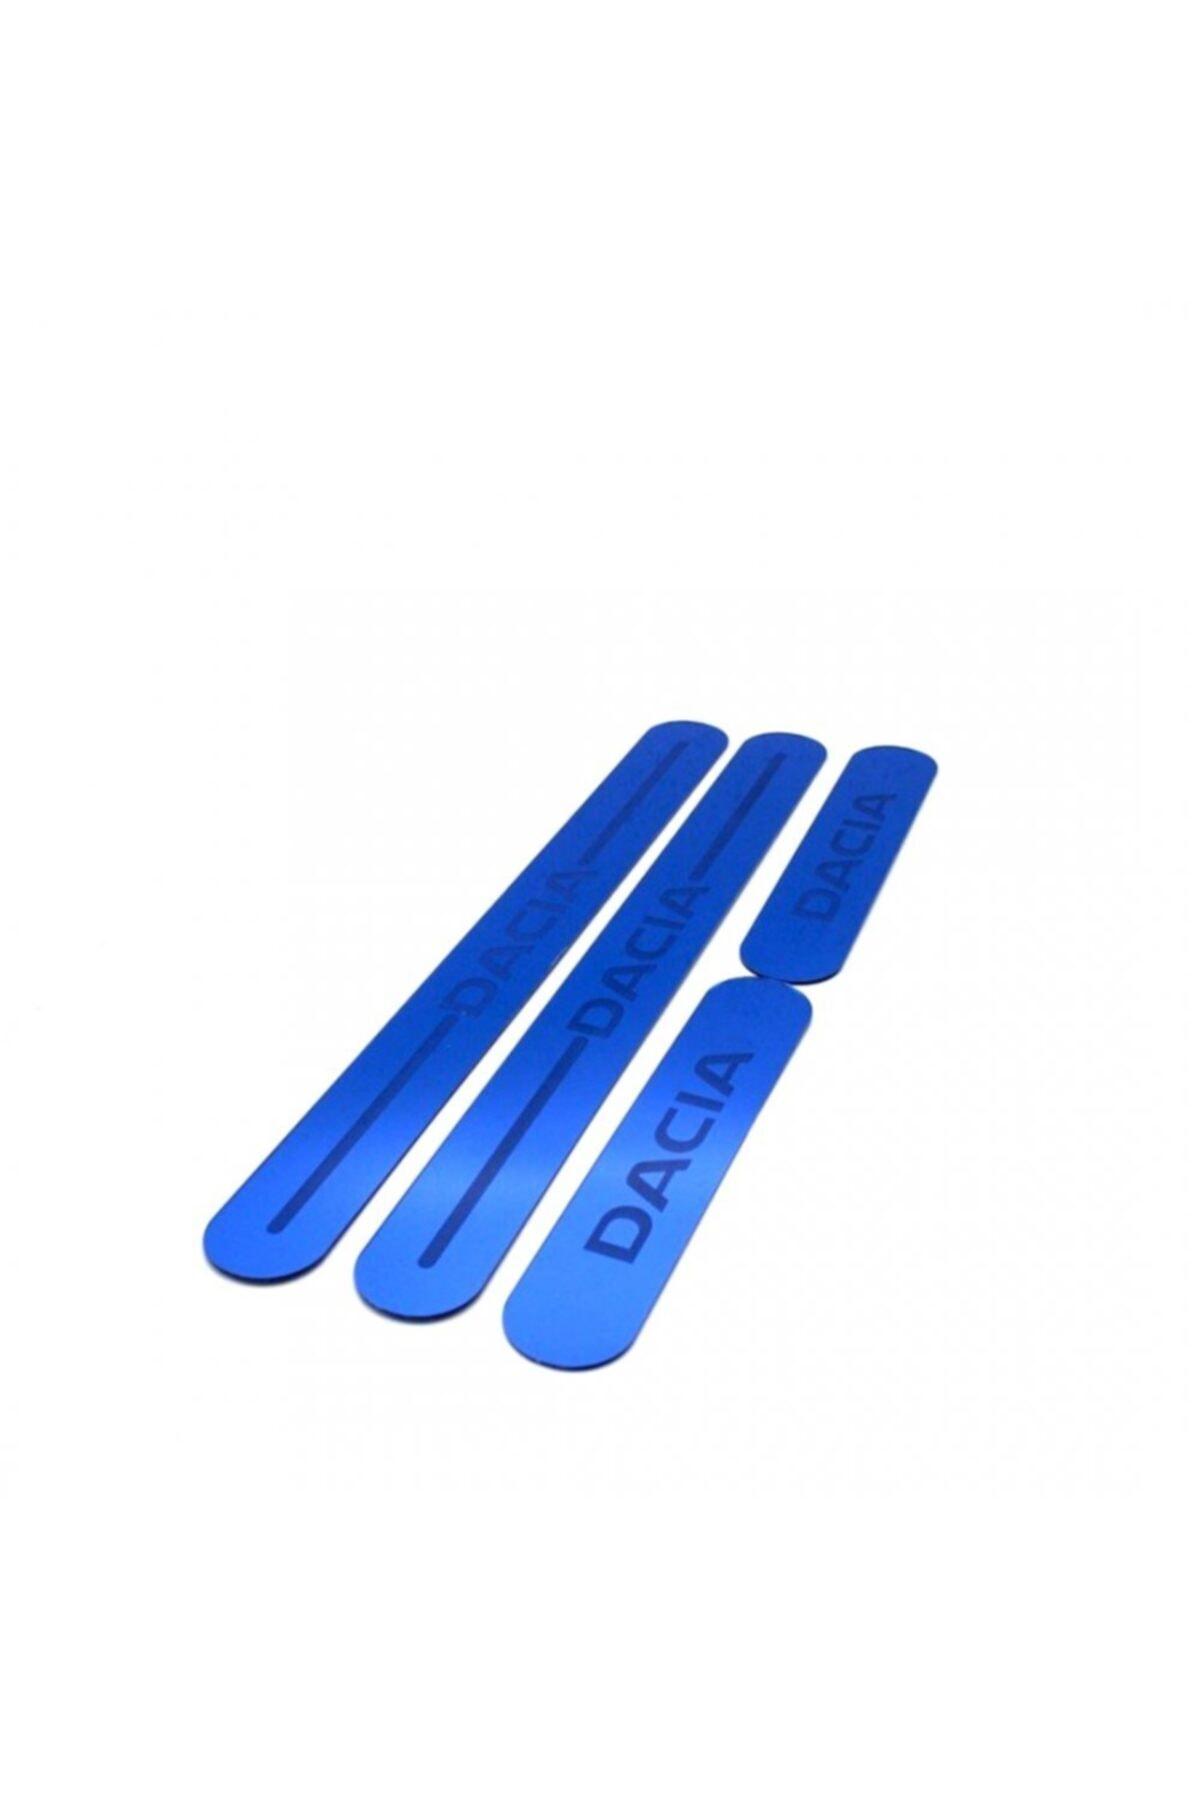 BoostZone Dacia Pleksi Üniversal Renkli Kapı Eşiği Mavi 1